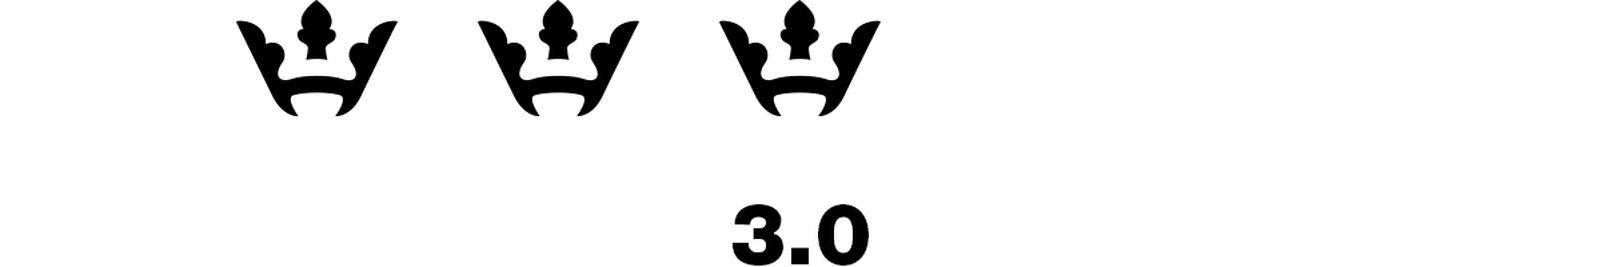 3.0 Amine ONEPOINTFIVE